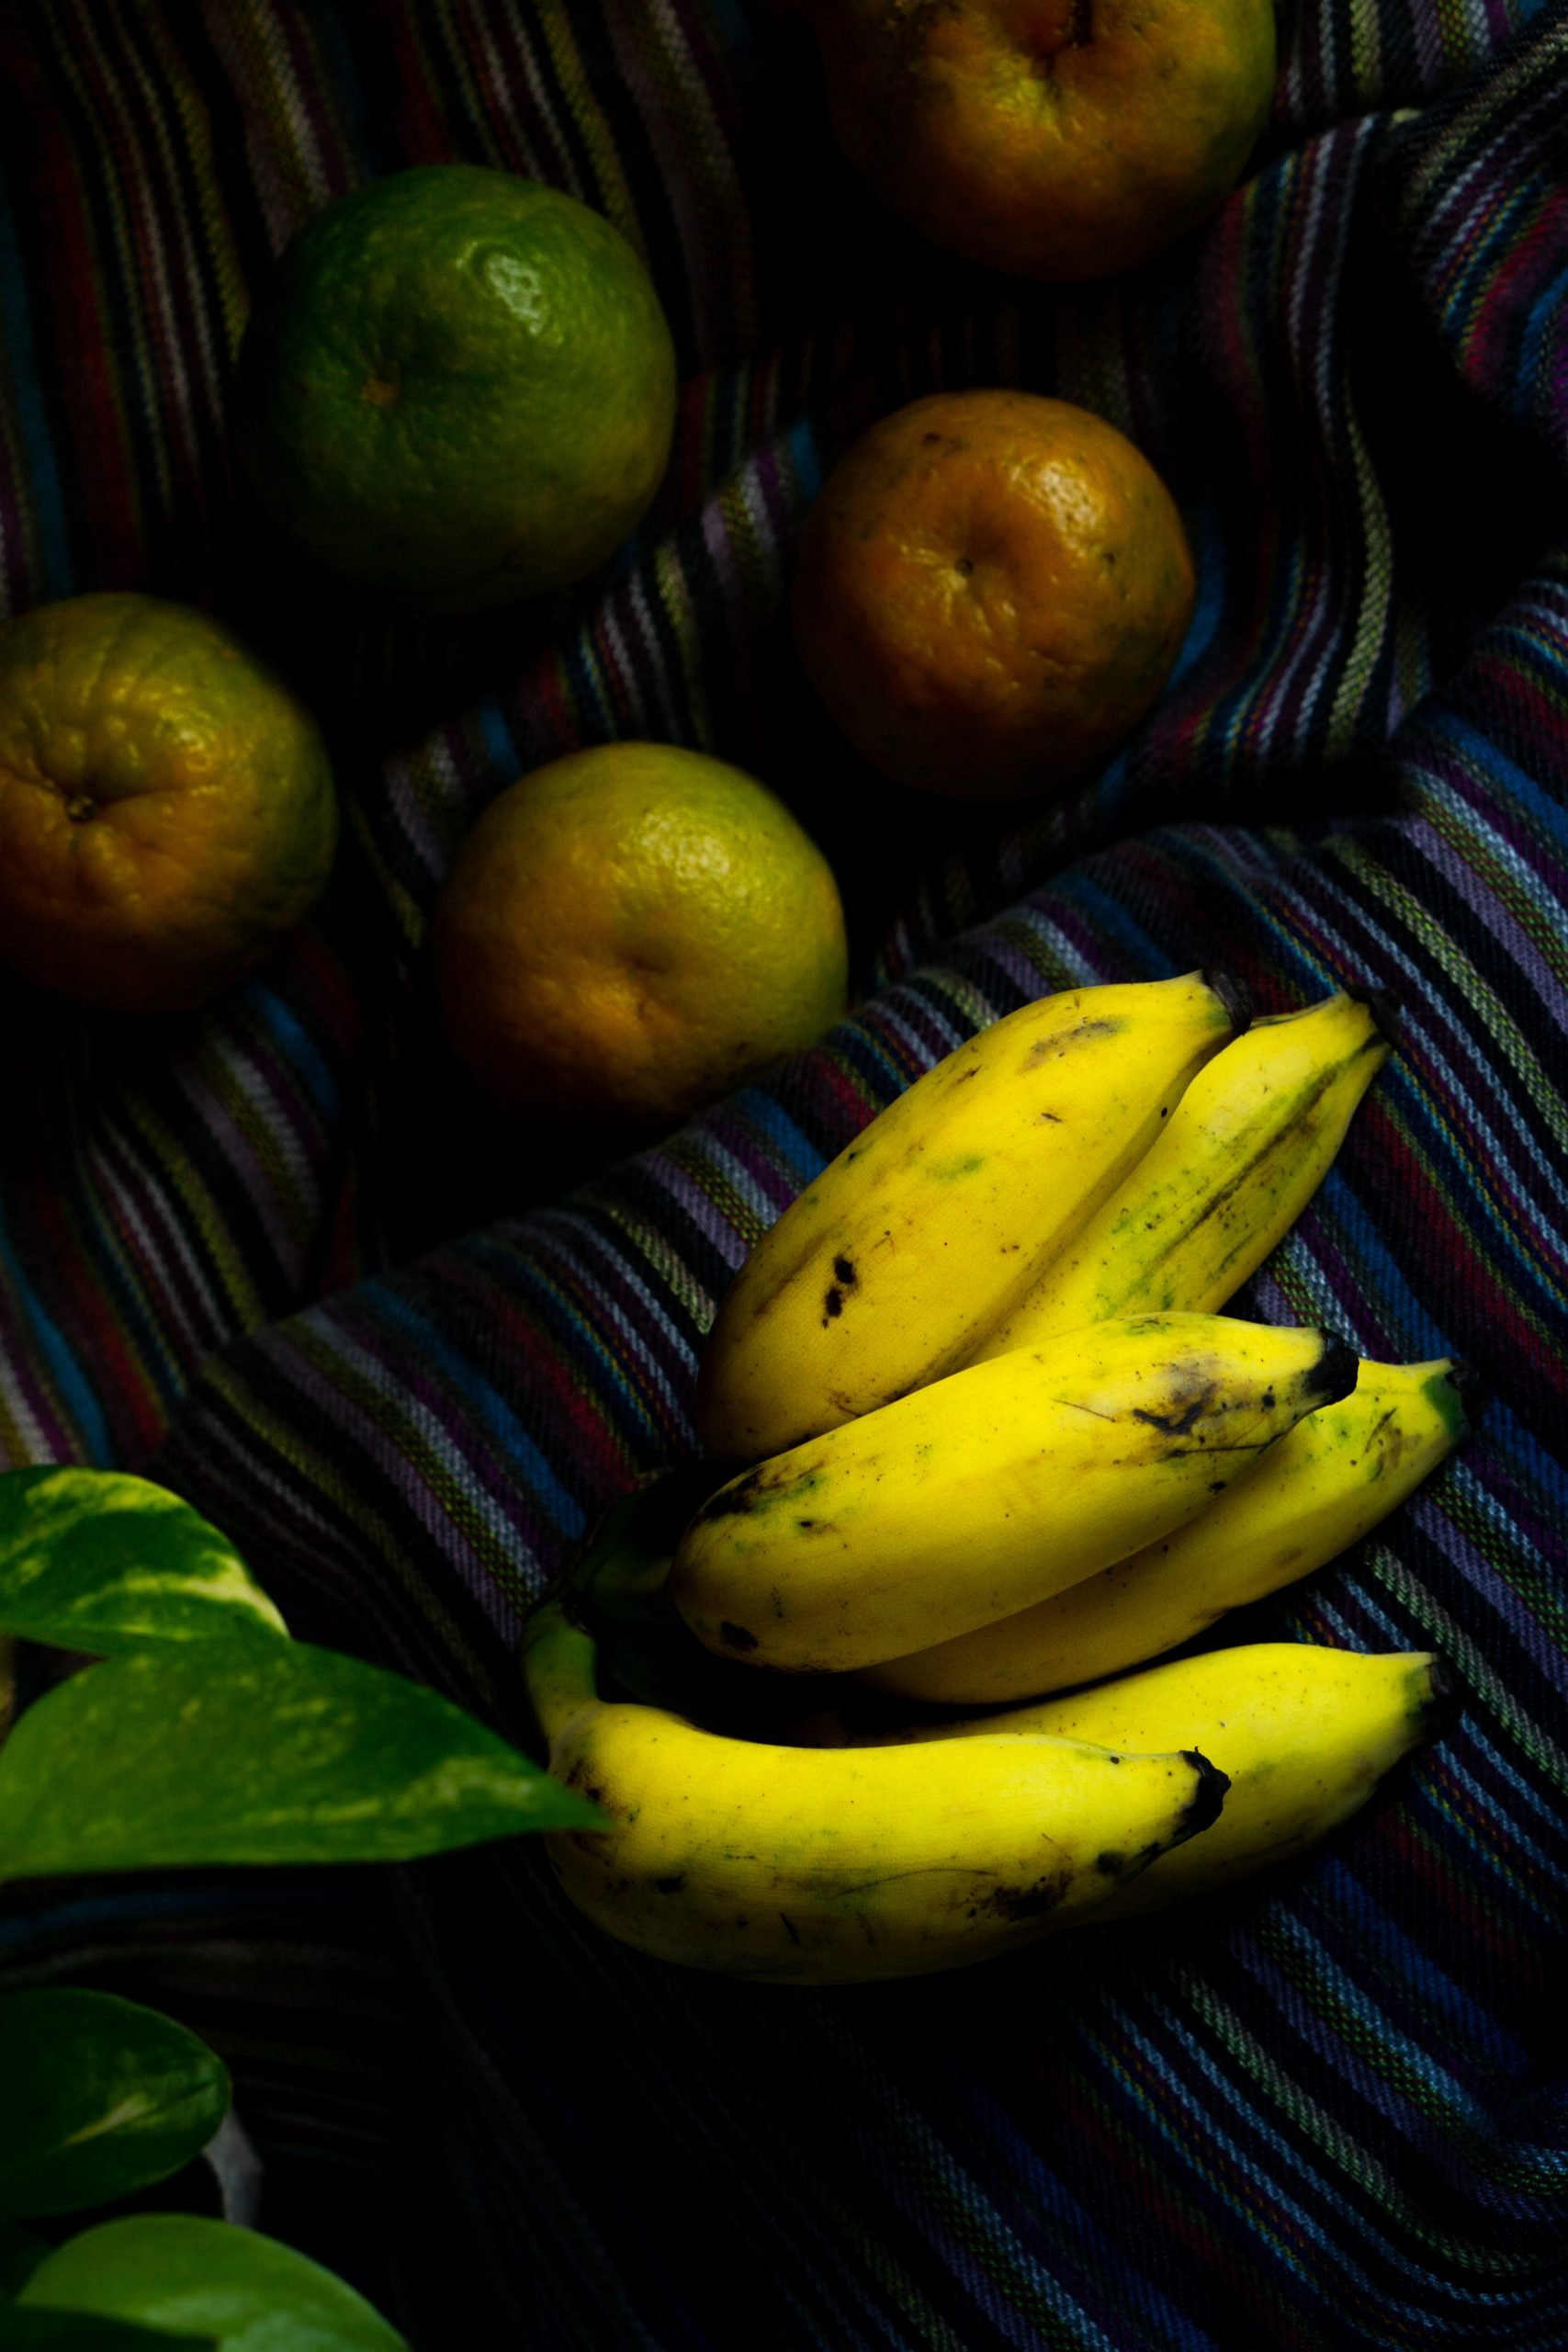 bananas and oranges